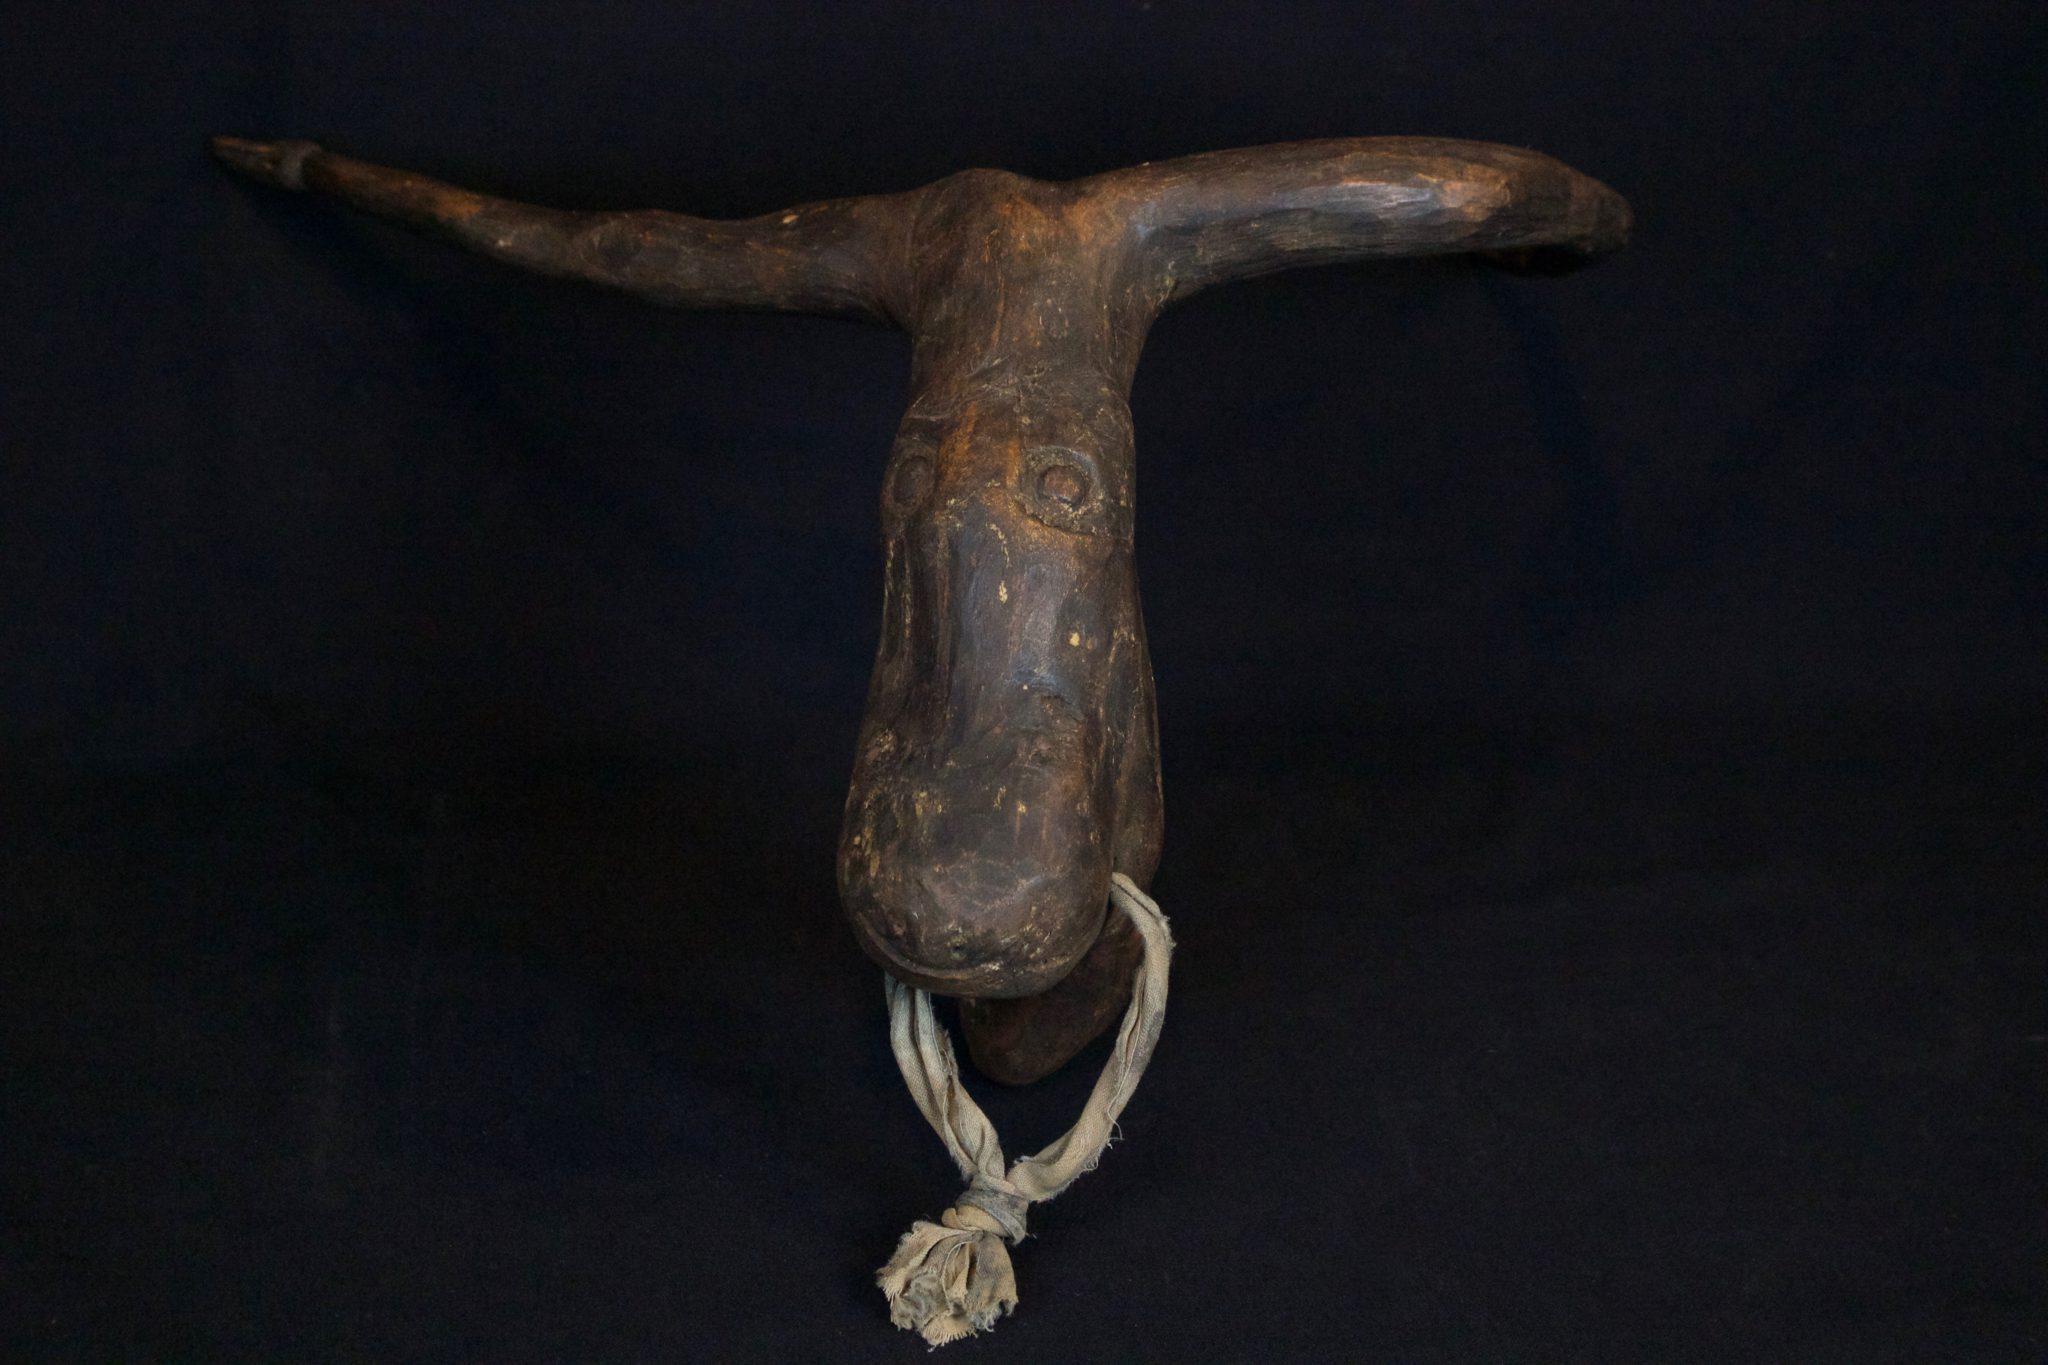 "Shaman Healing Amulet/Talisman - Cow, Octopus, Monkey, Bird West Sumba Island, Lesser Sunda Islands, Indonesia Early 20th c, Wood. Used in healing rituals, 10"" x 16"" x 13"", $600."